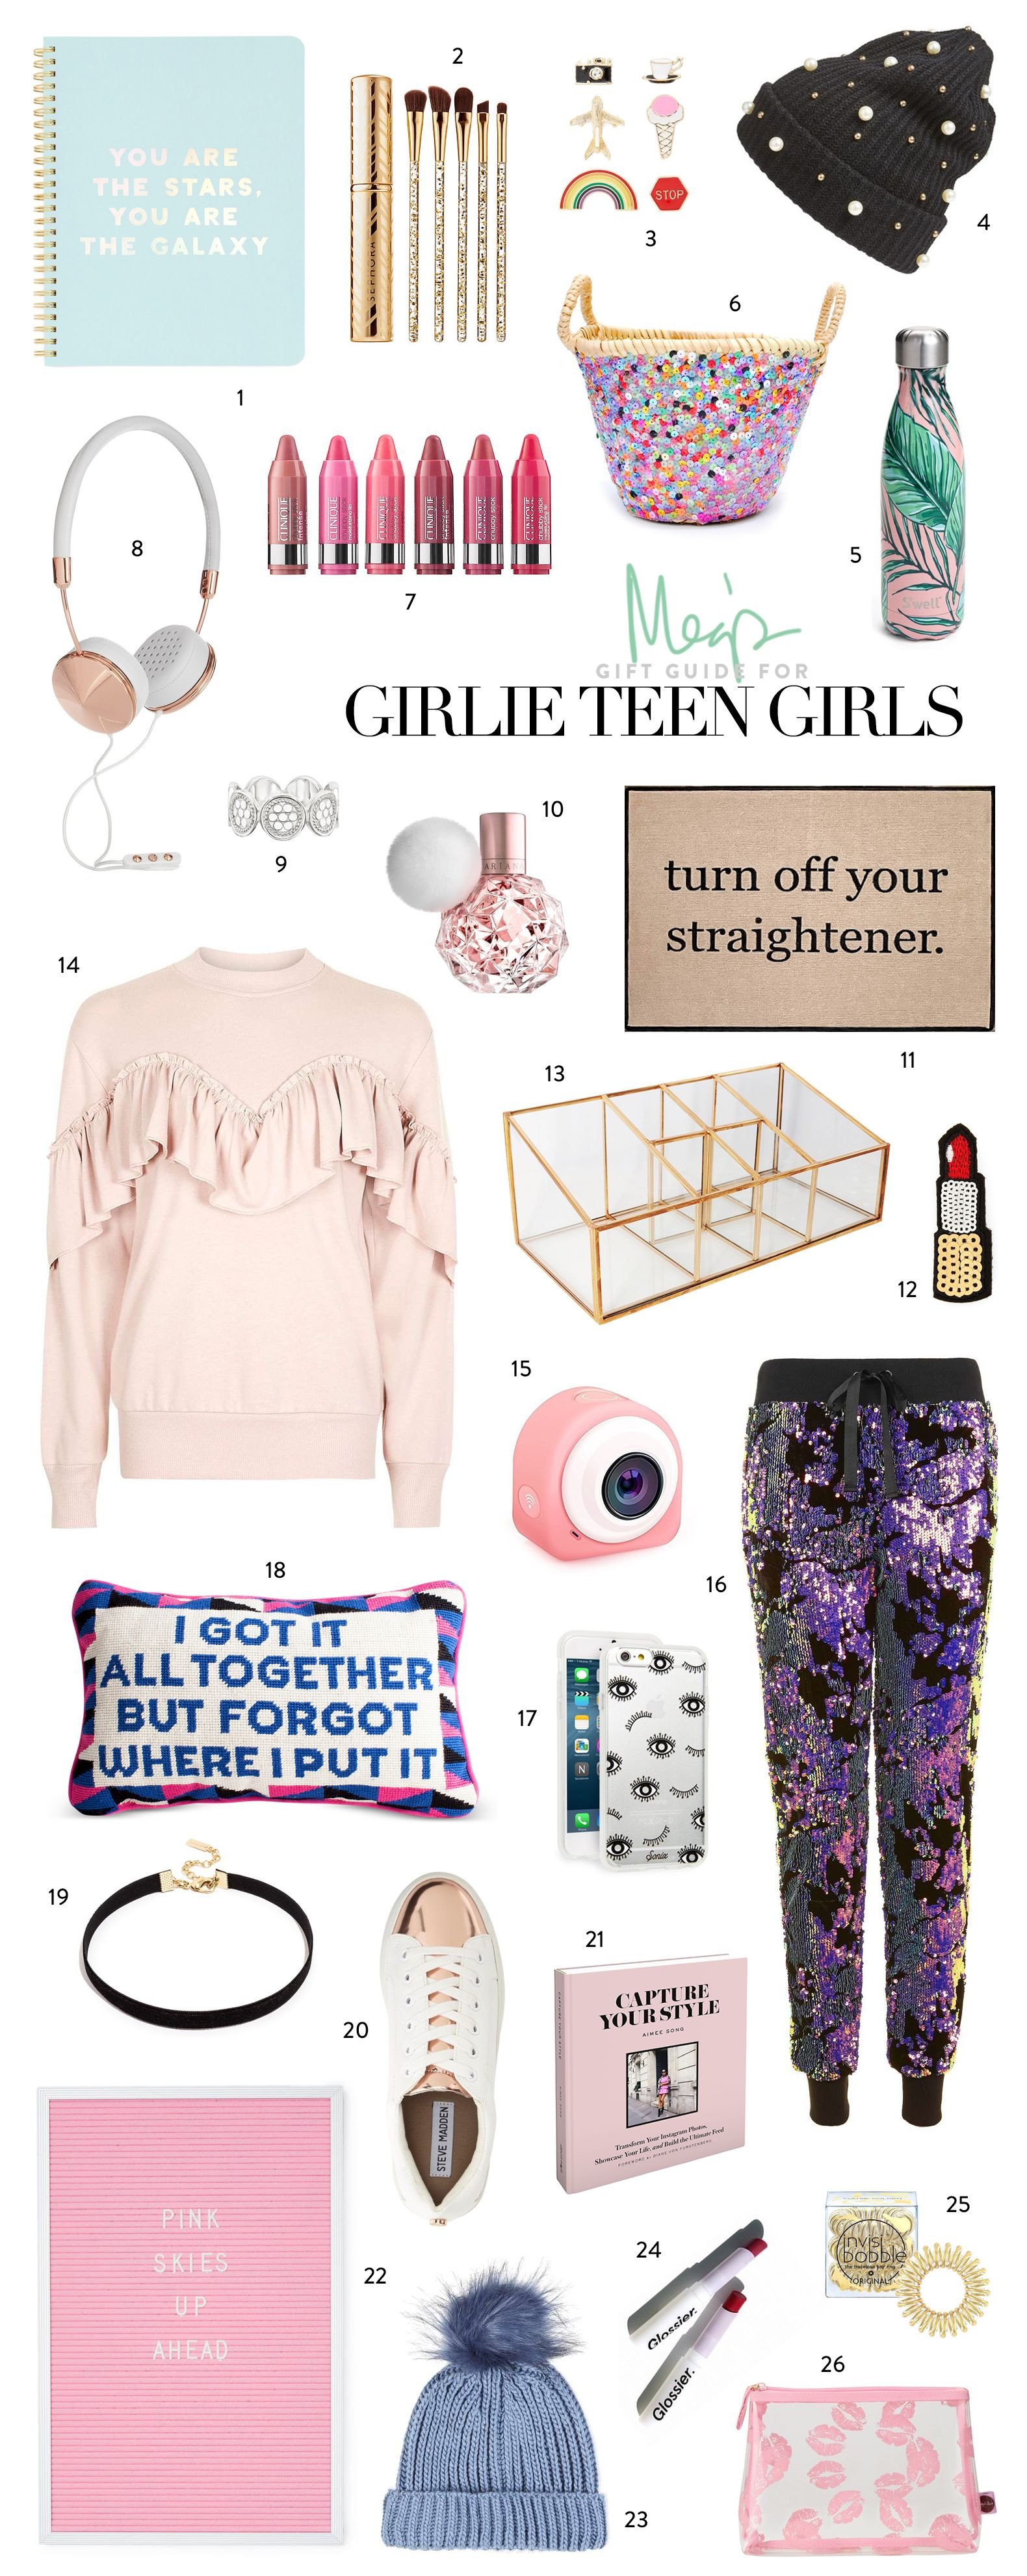 Gift Ideas For Teenage Girlfriend  Holiday Gift Guide Girlie Teen Girls